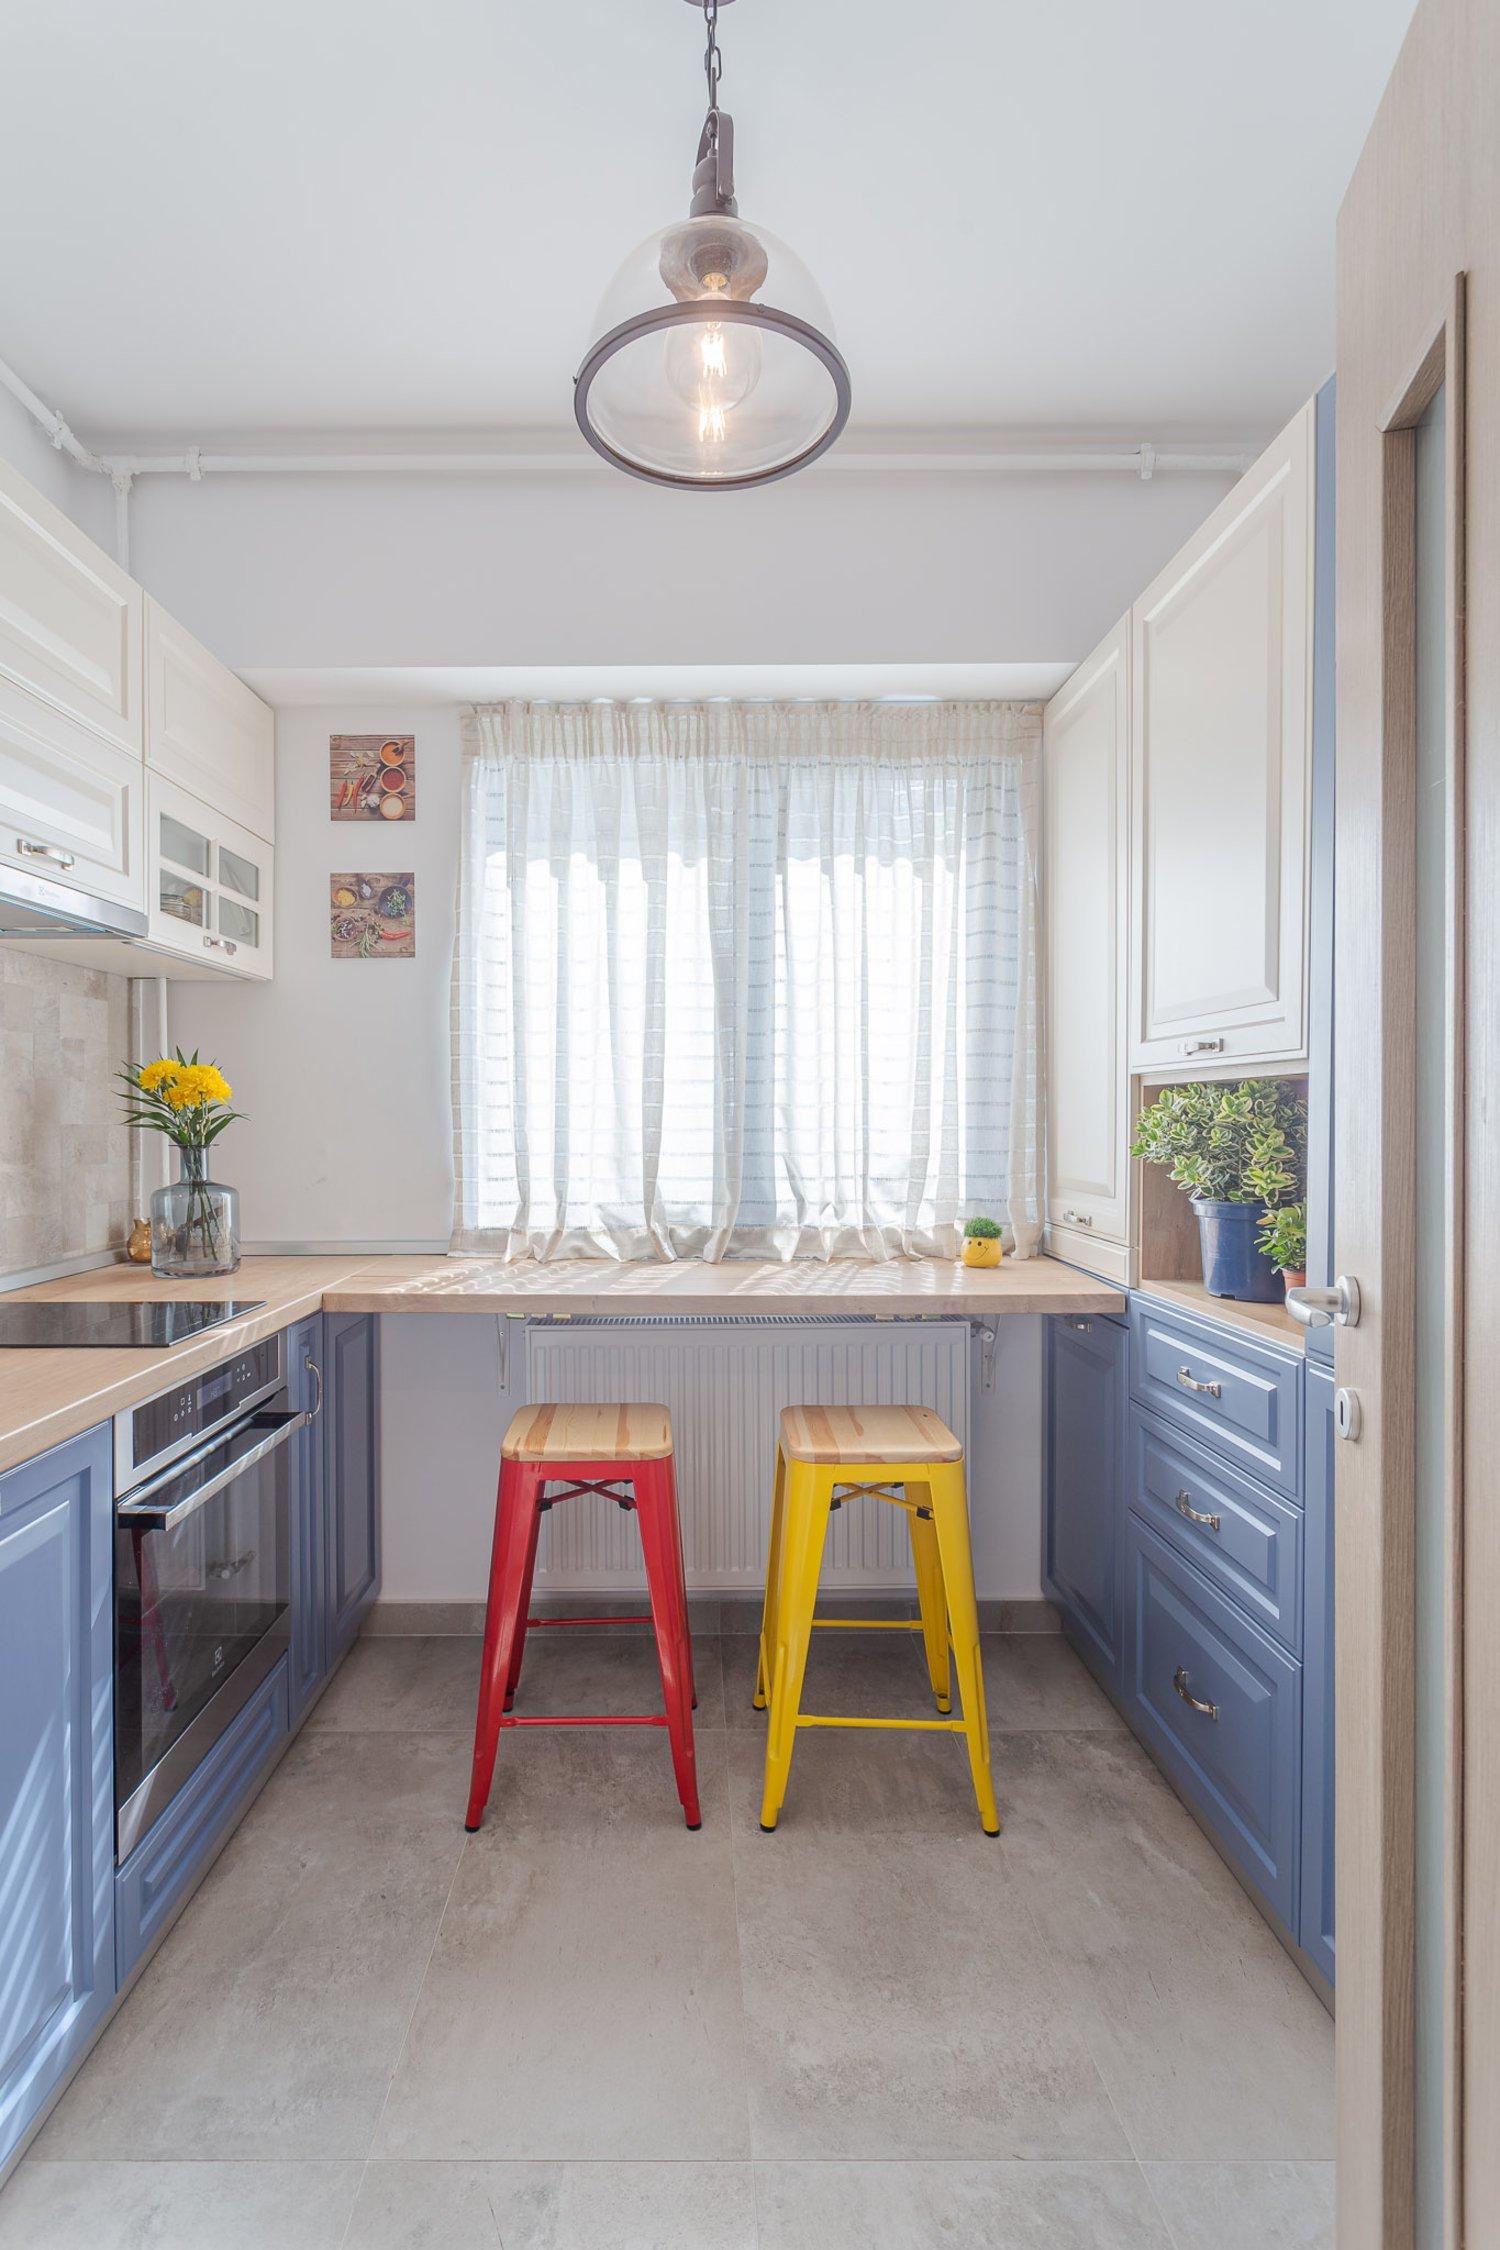 Amenajare apartament de burlac - bucatarie in stil clasic, mobilier alb si albastru bleu, scaune metalice galben si rosu